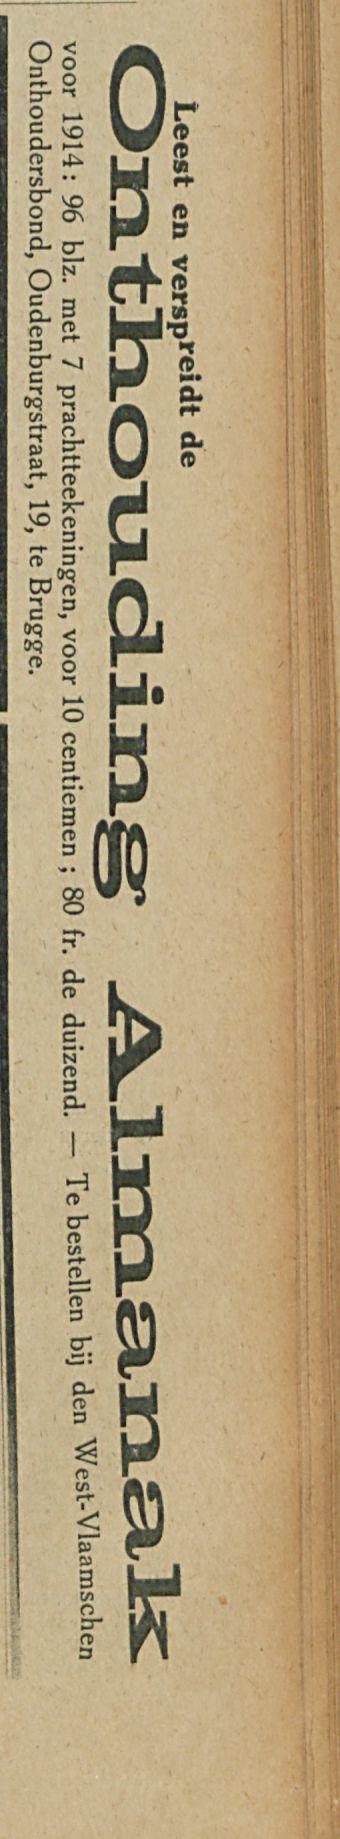 Onthouding Almanak